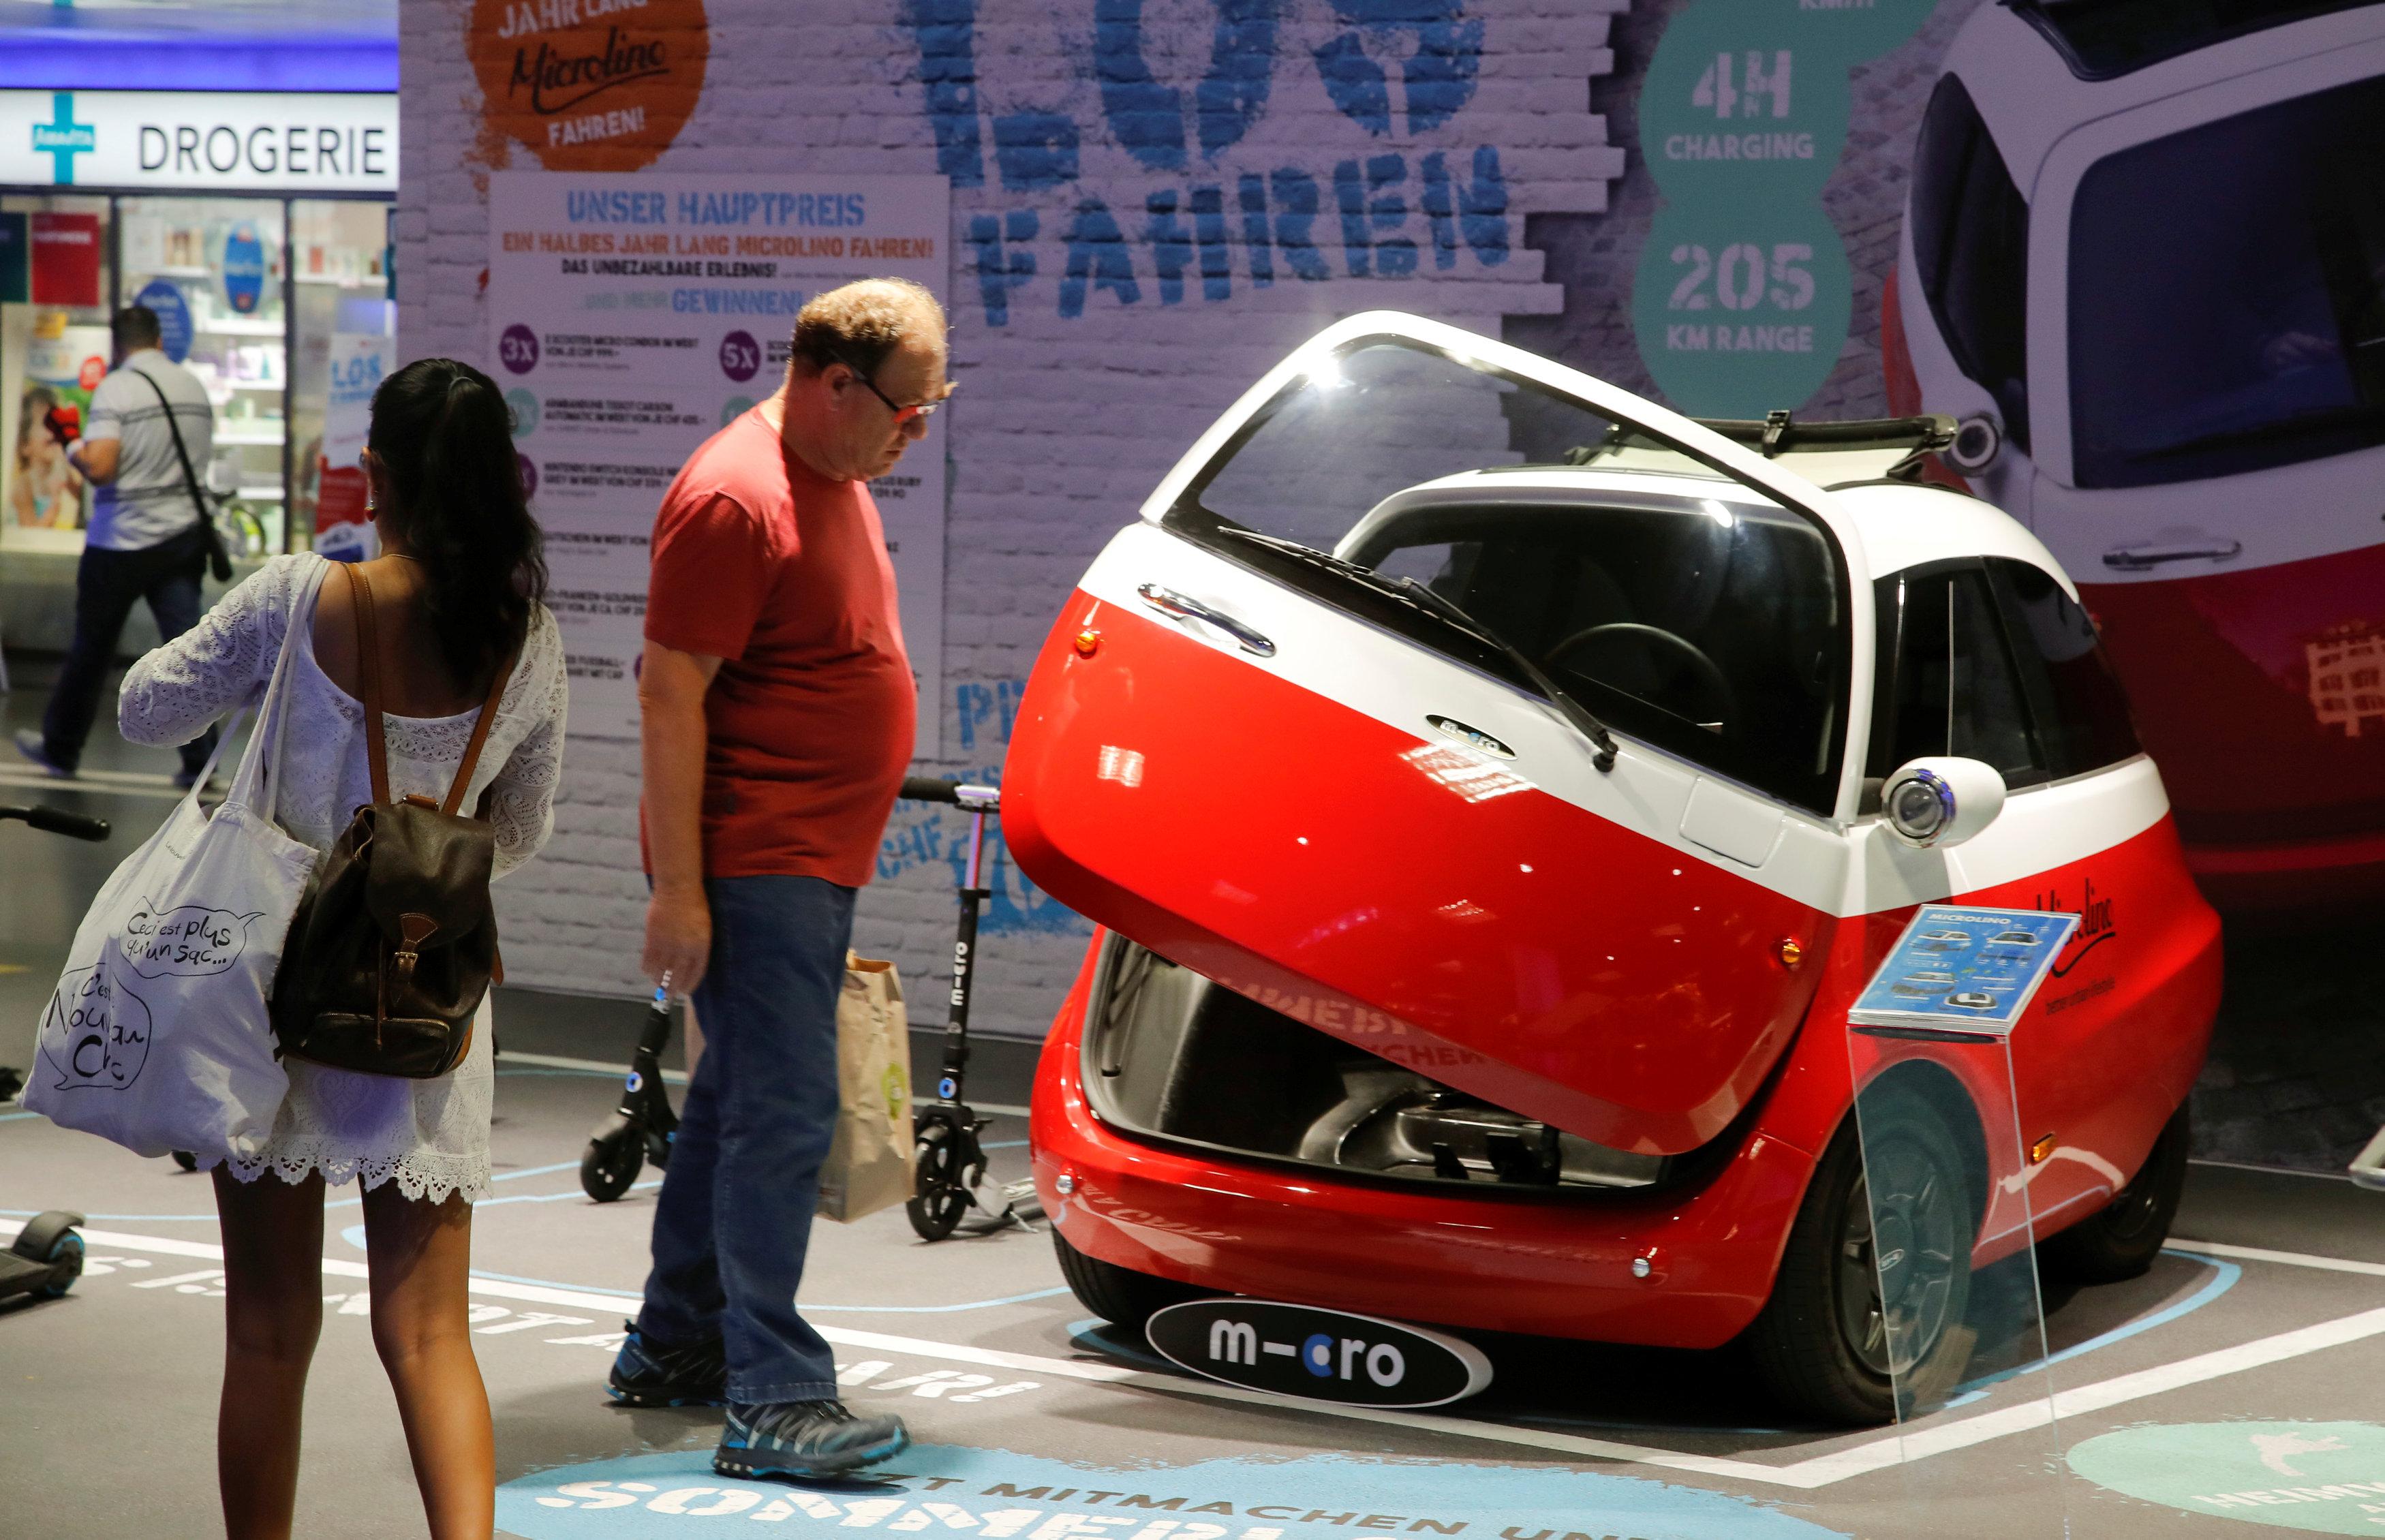 An electric-powered Microlino car built by Swiss Microlino AG.